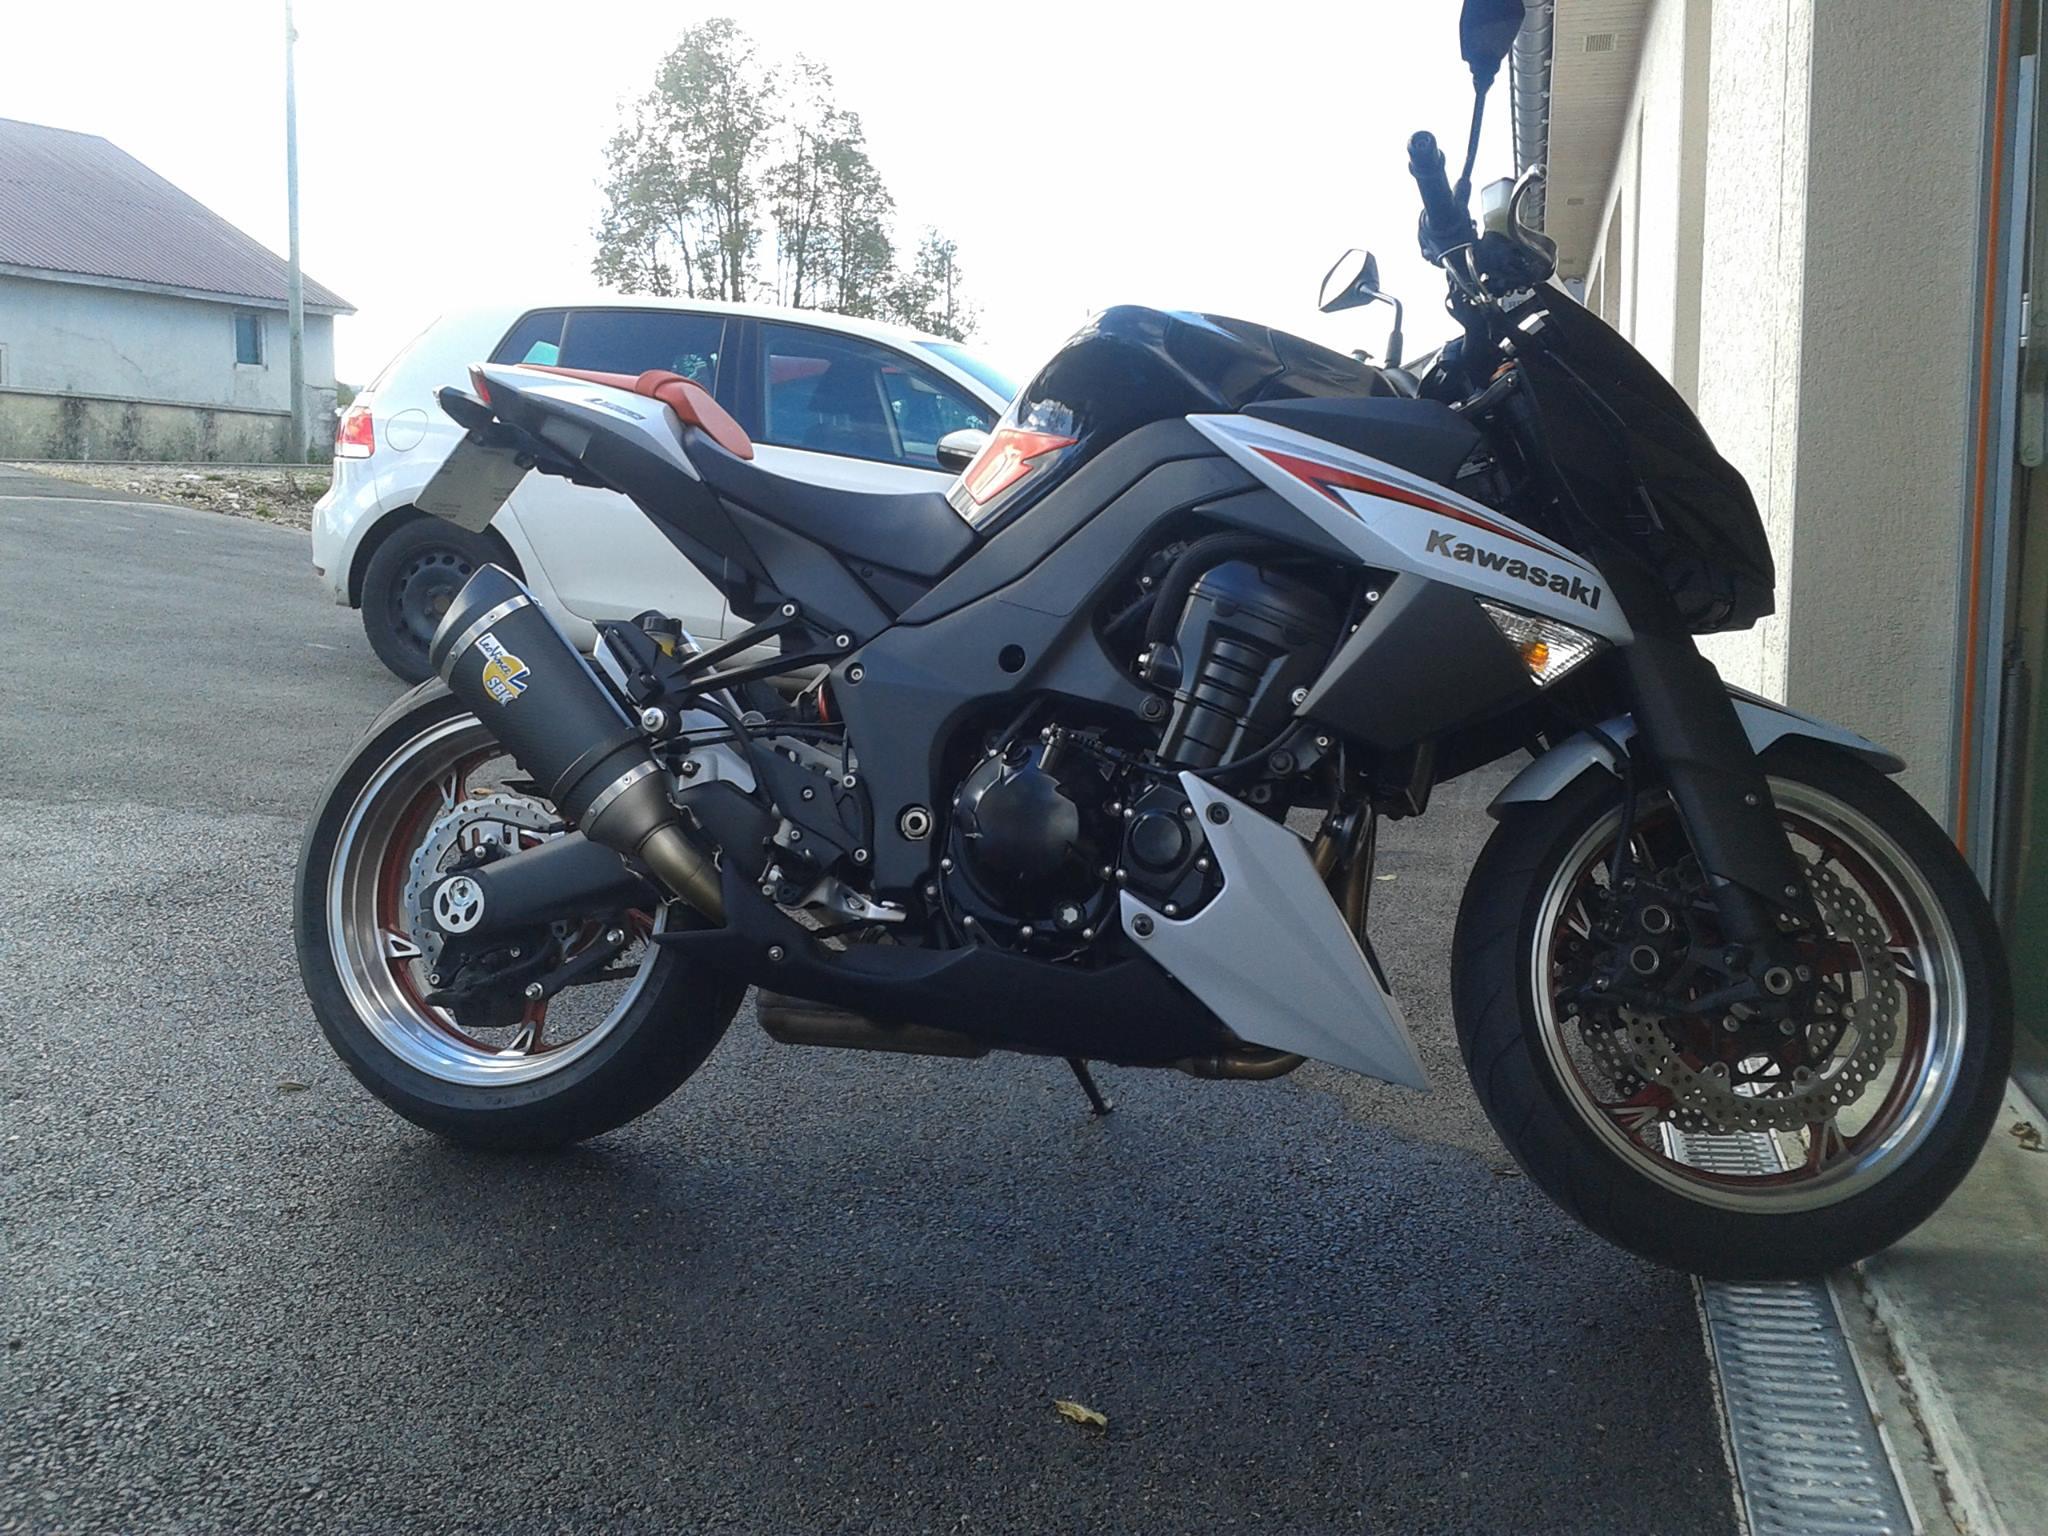 [VENDU] Z1000 ABS 2013 edition speciale 151126052511995070